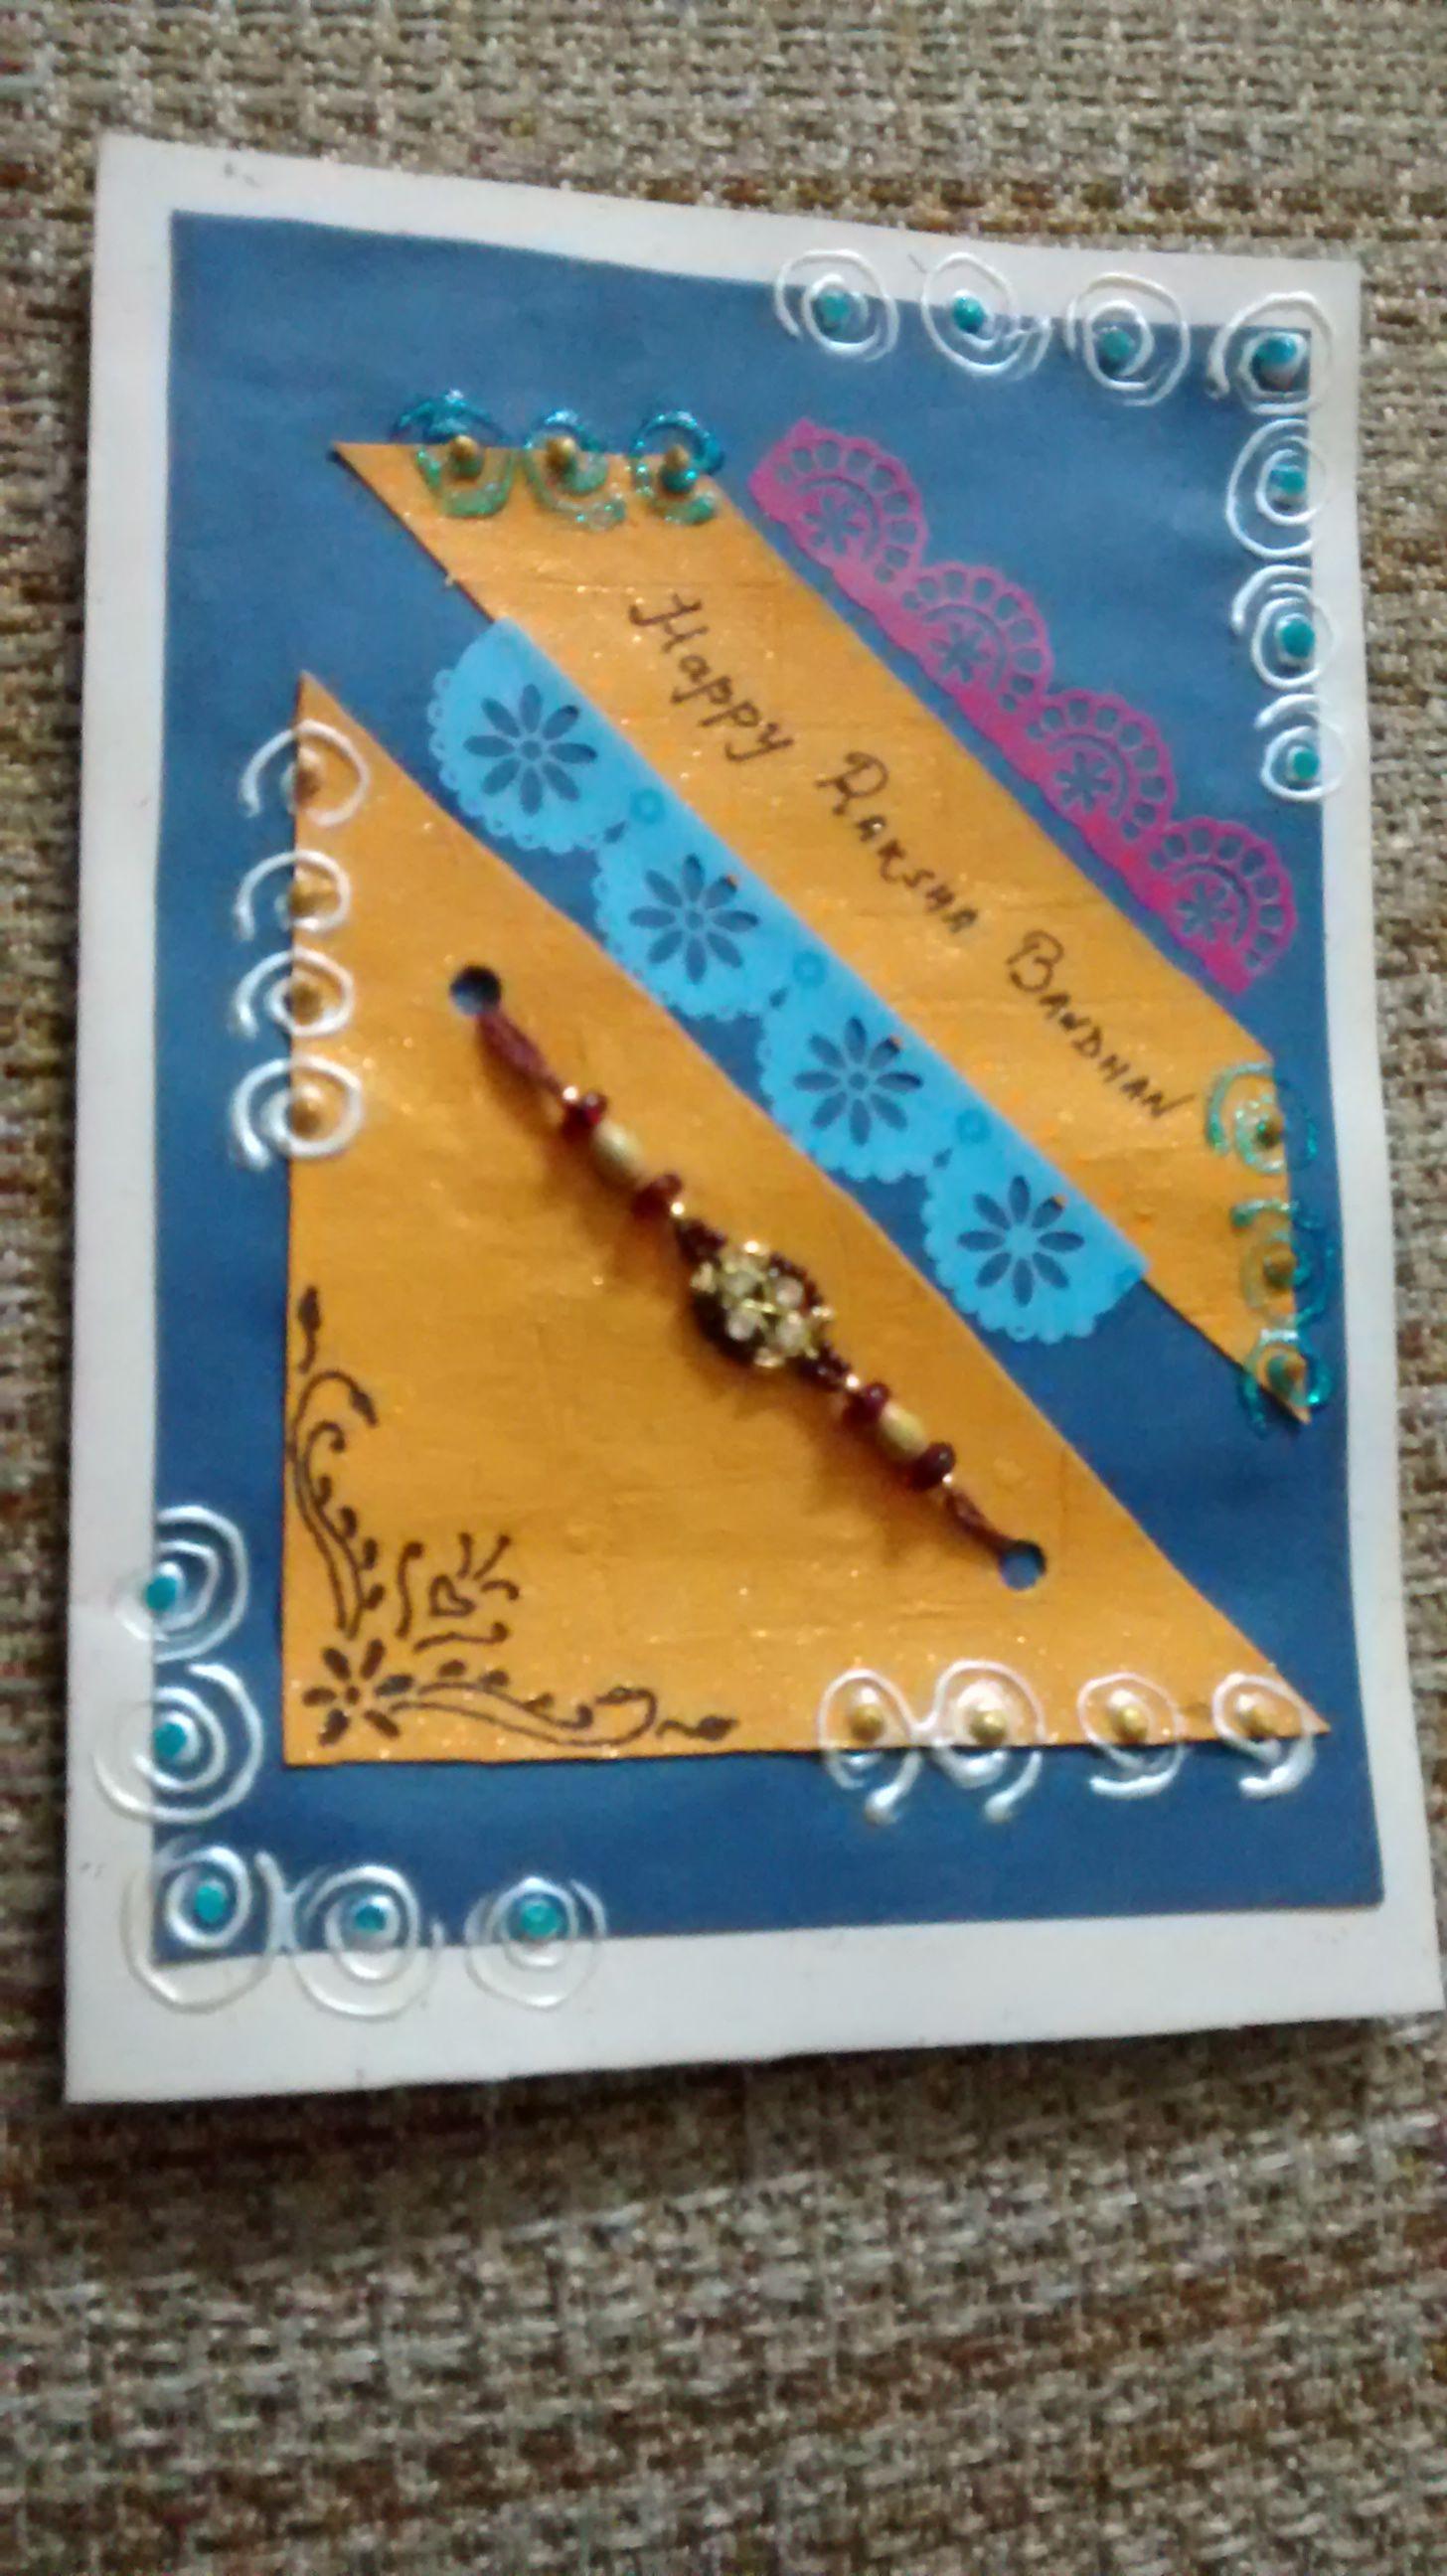 Pin by monika goel on rakhi pinterest rakhi rakhi cards and cards rakhi cards handmade rakhi gift tags greeting card card sentiments congratulations card gift ideas kristyandbryce Choice Image